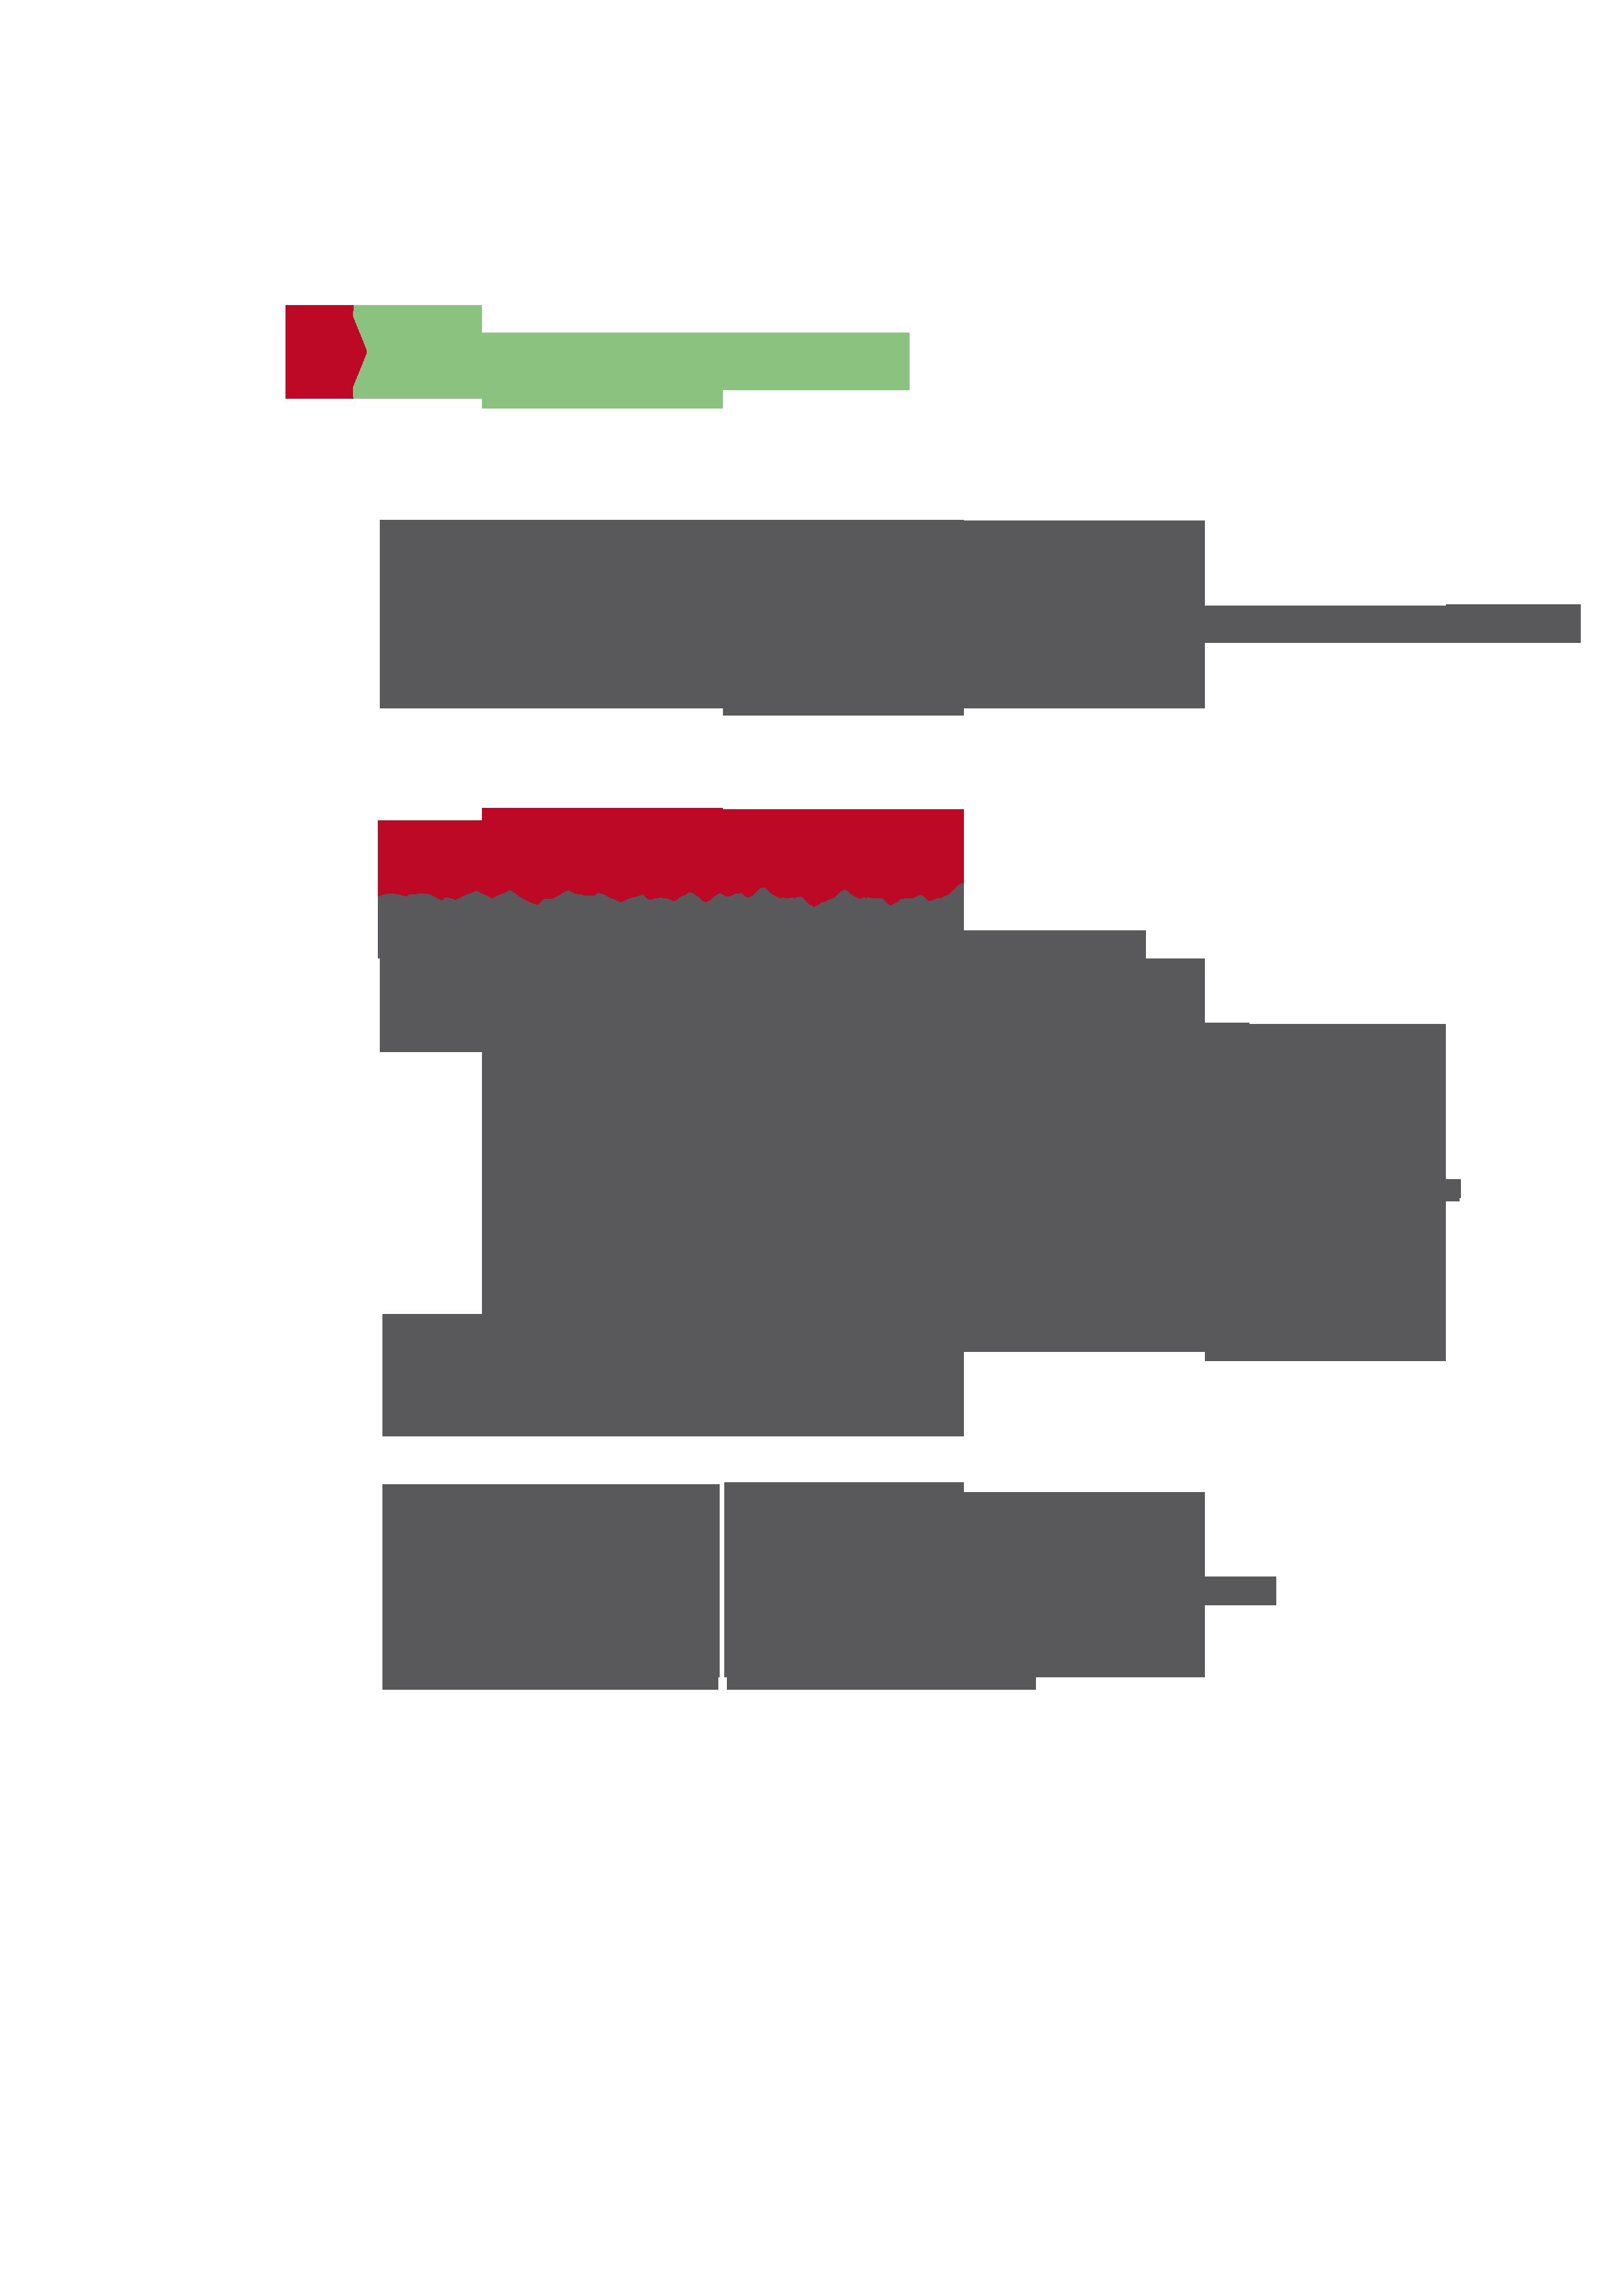 programa02.png